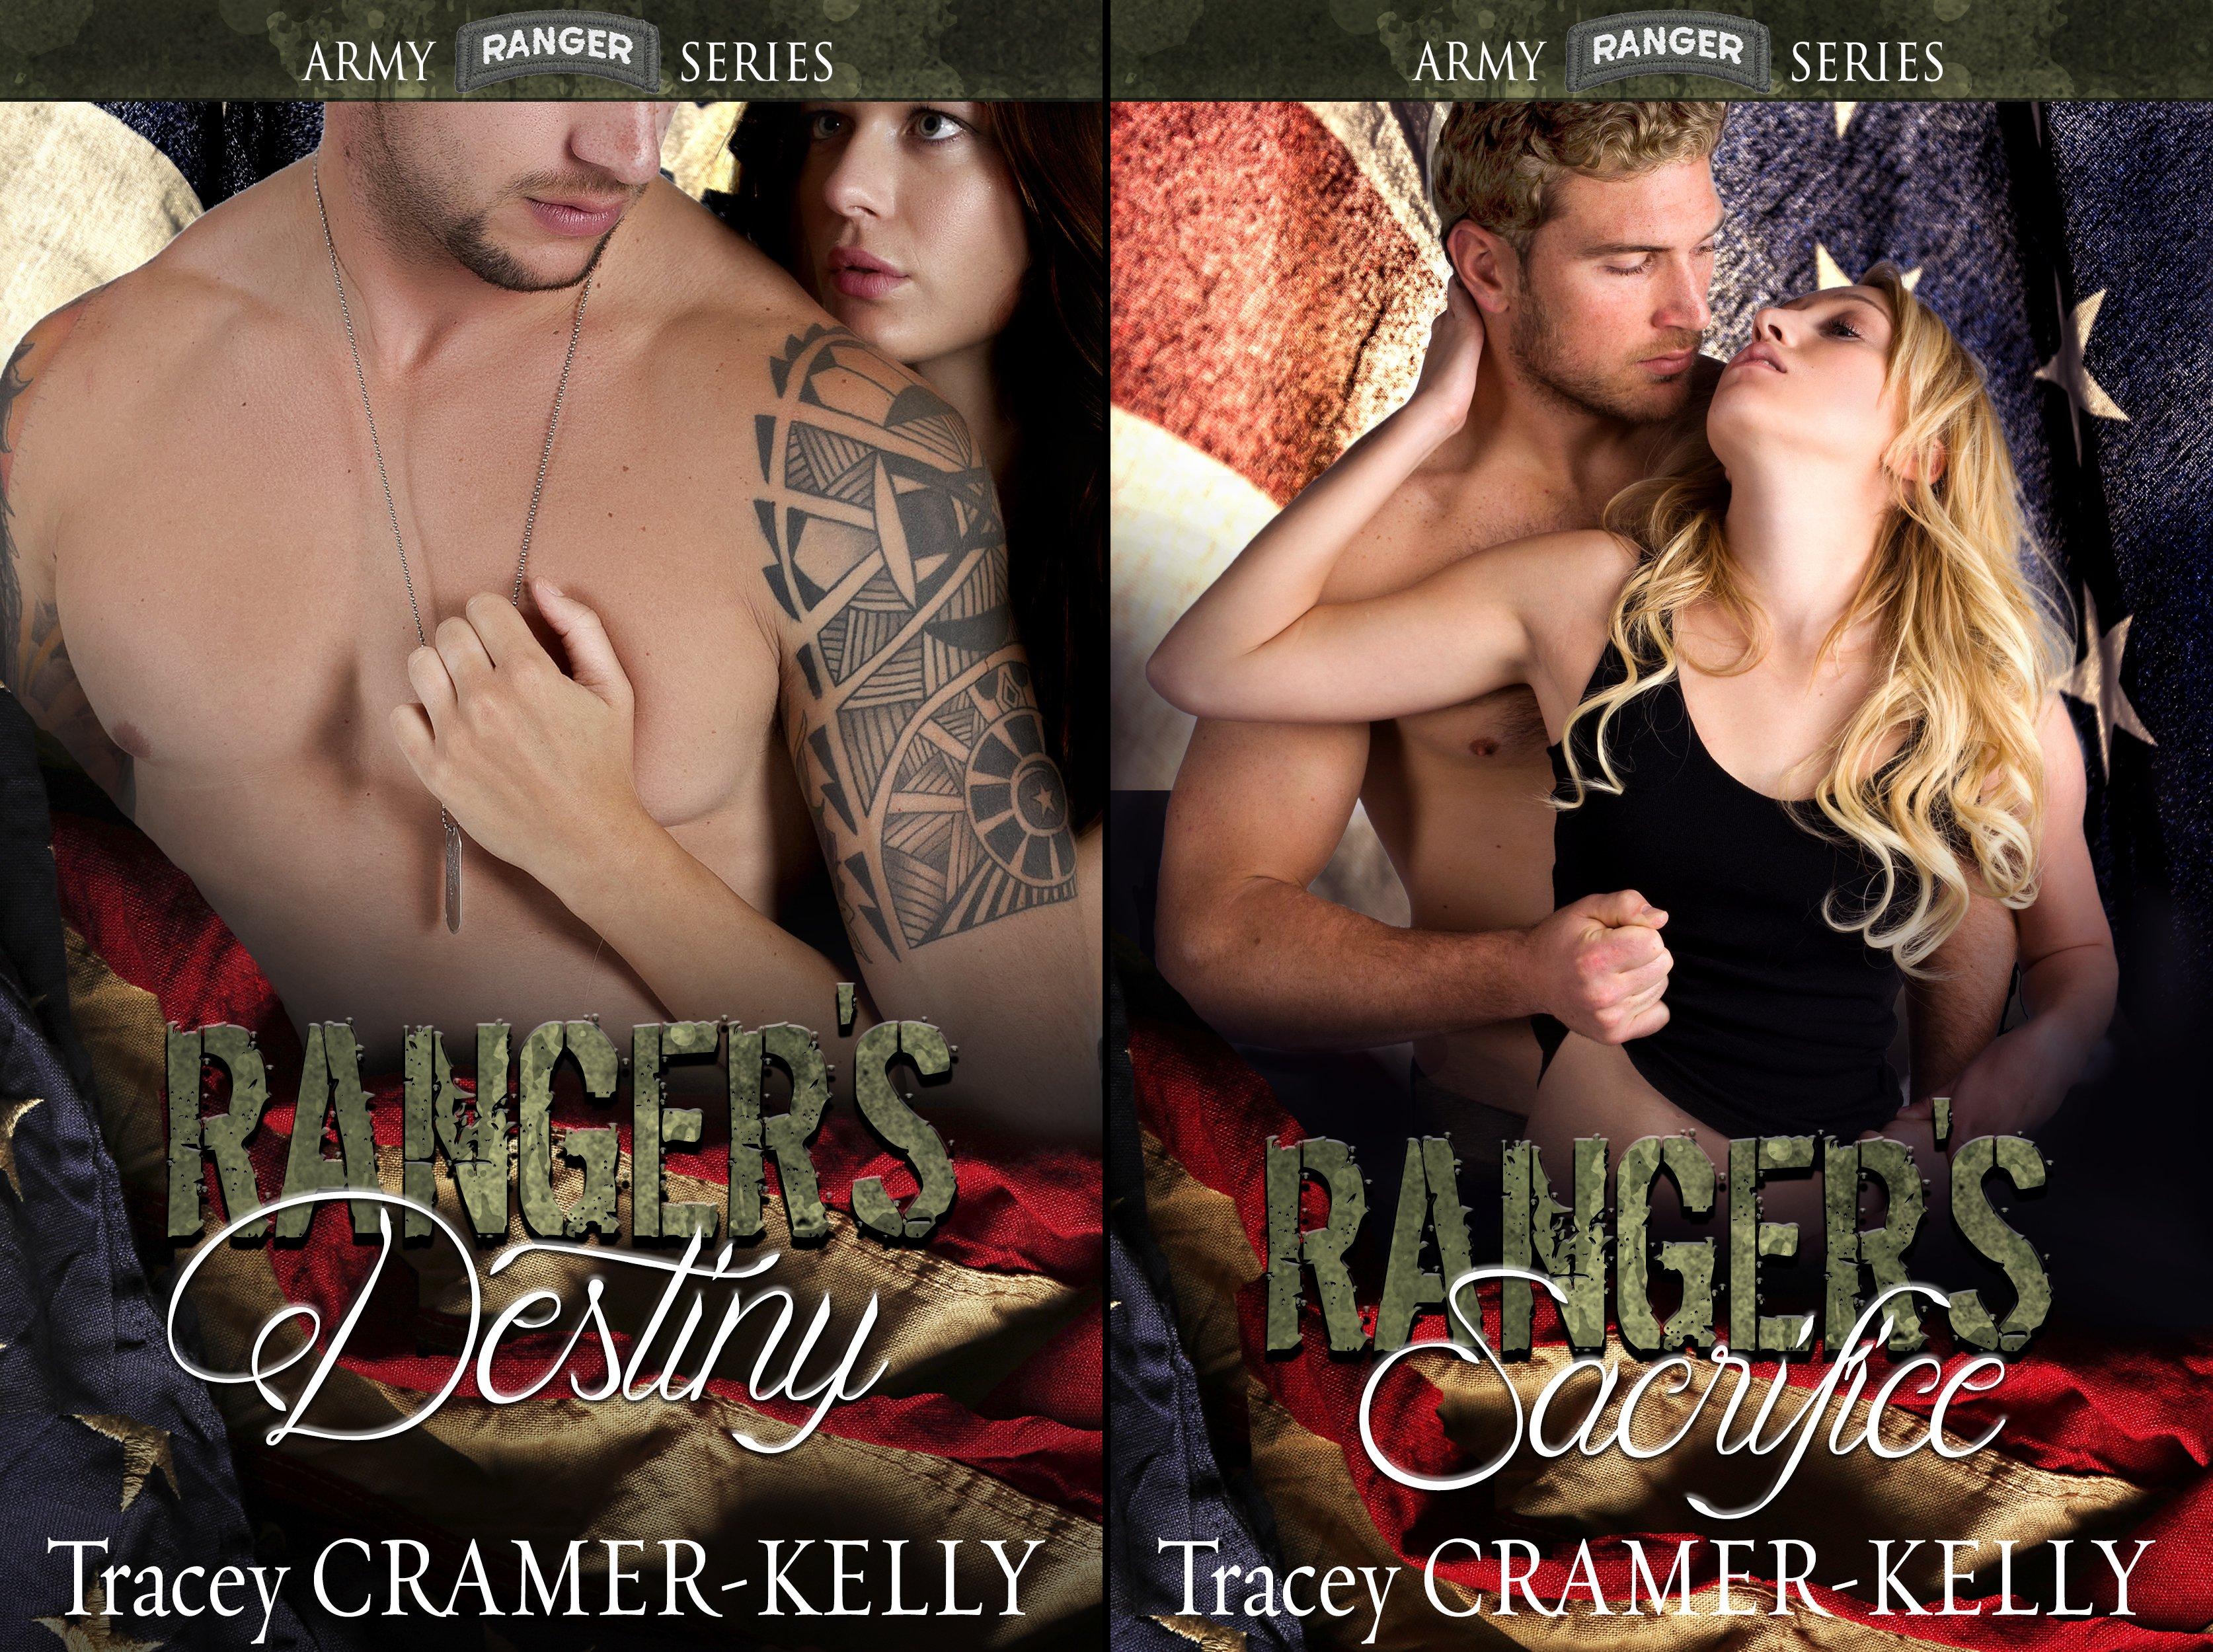 Army Ranger Series (2 Book Series)